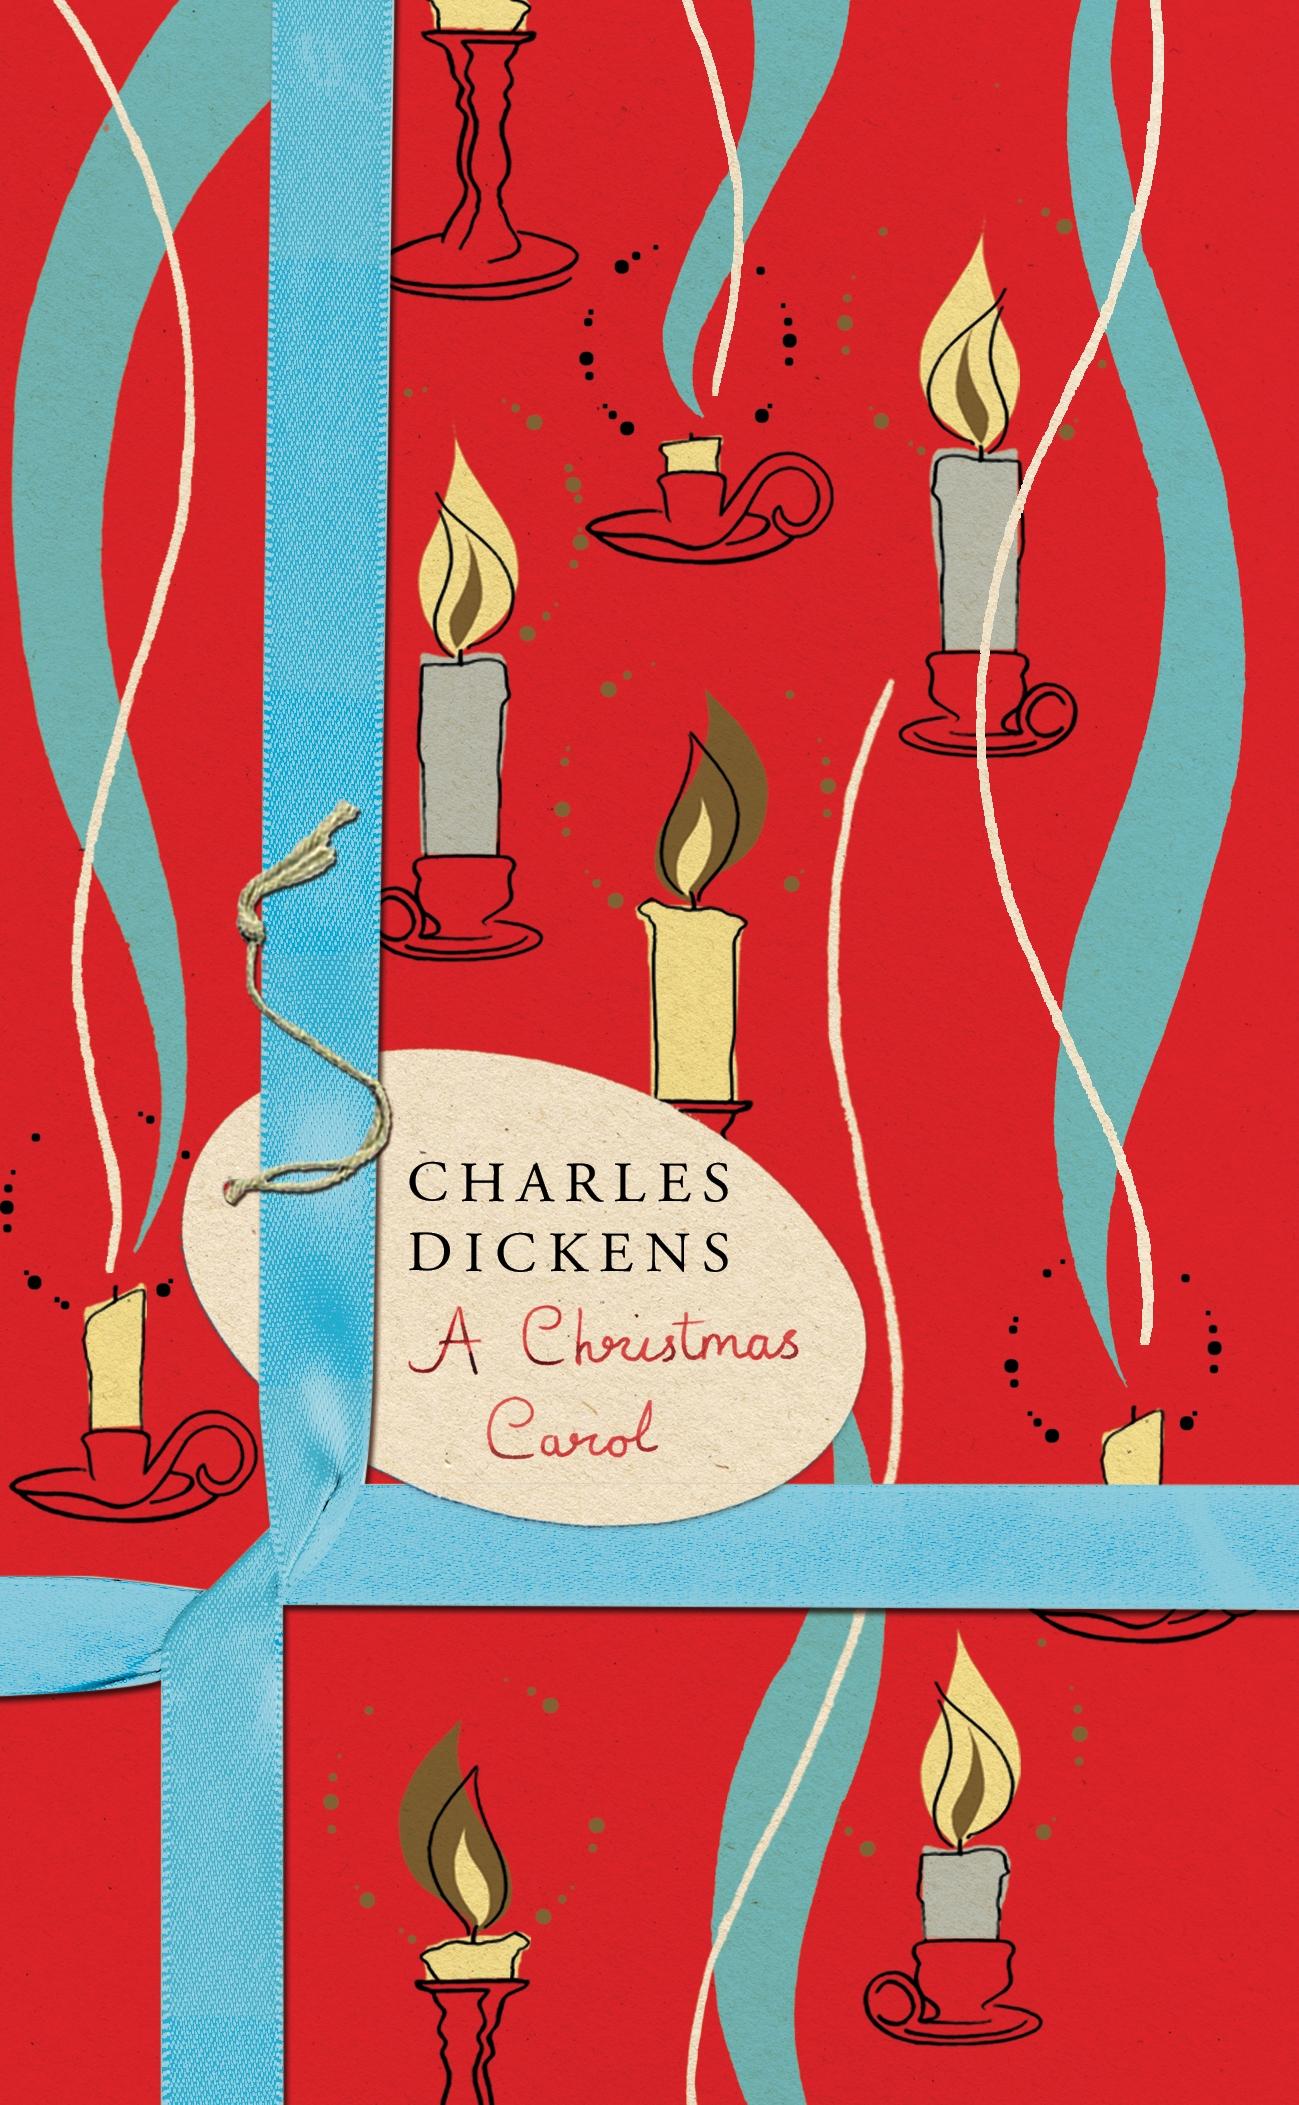 A Christmas Carol (Vintage Christmas) by Charles Dickens - Penguin Books Australia